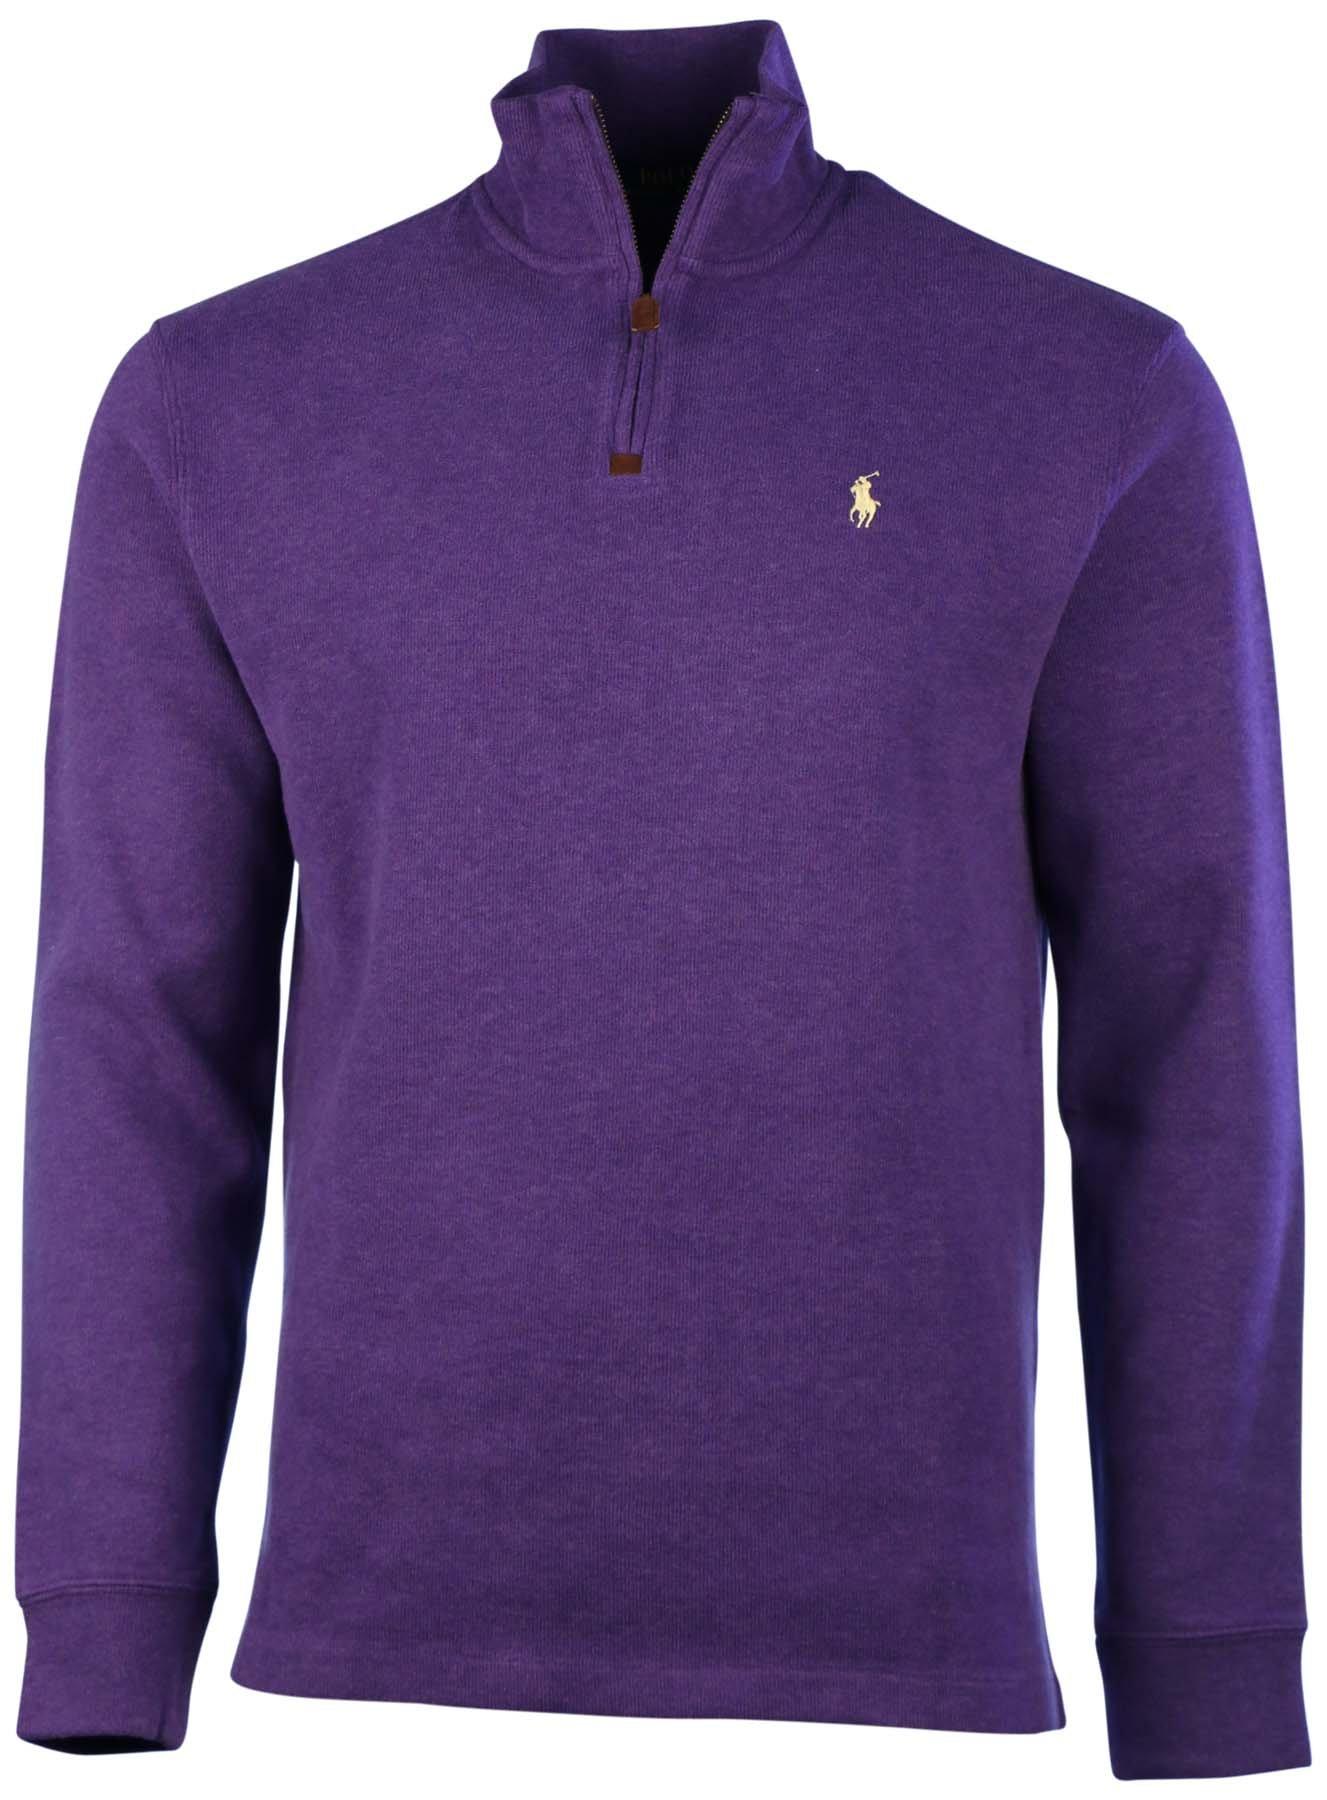 Polo Ralph Lauren Mens 1/2 Zip Pullover Sweater,Saranac Purple,Medium